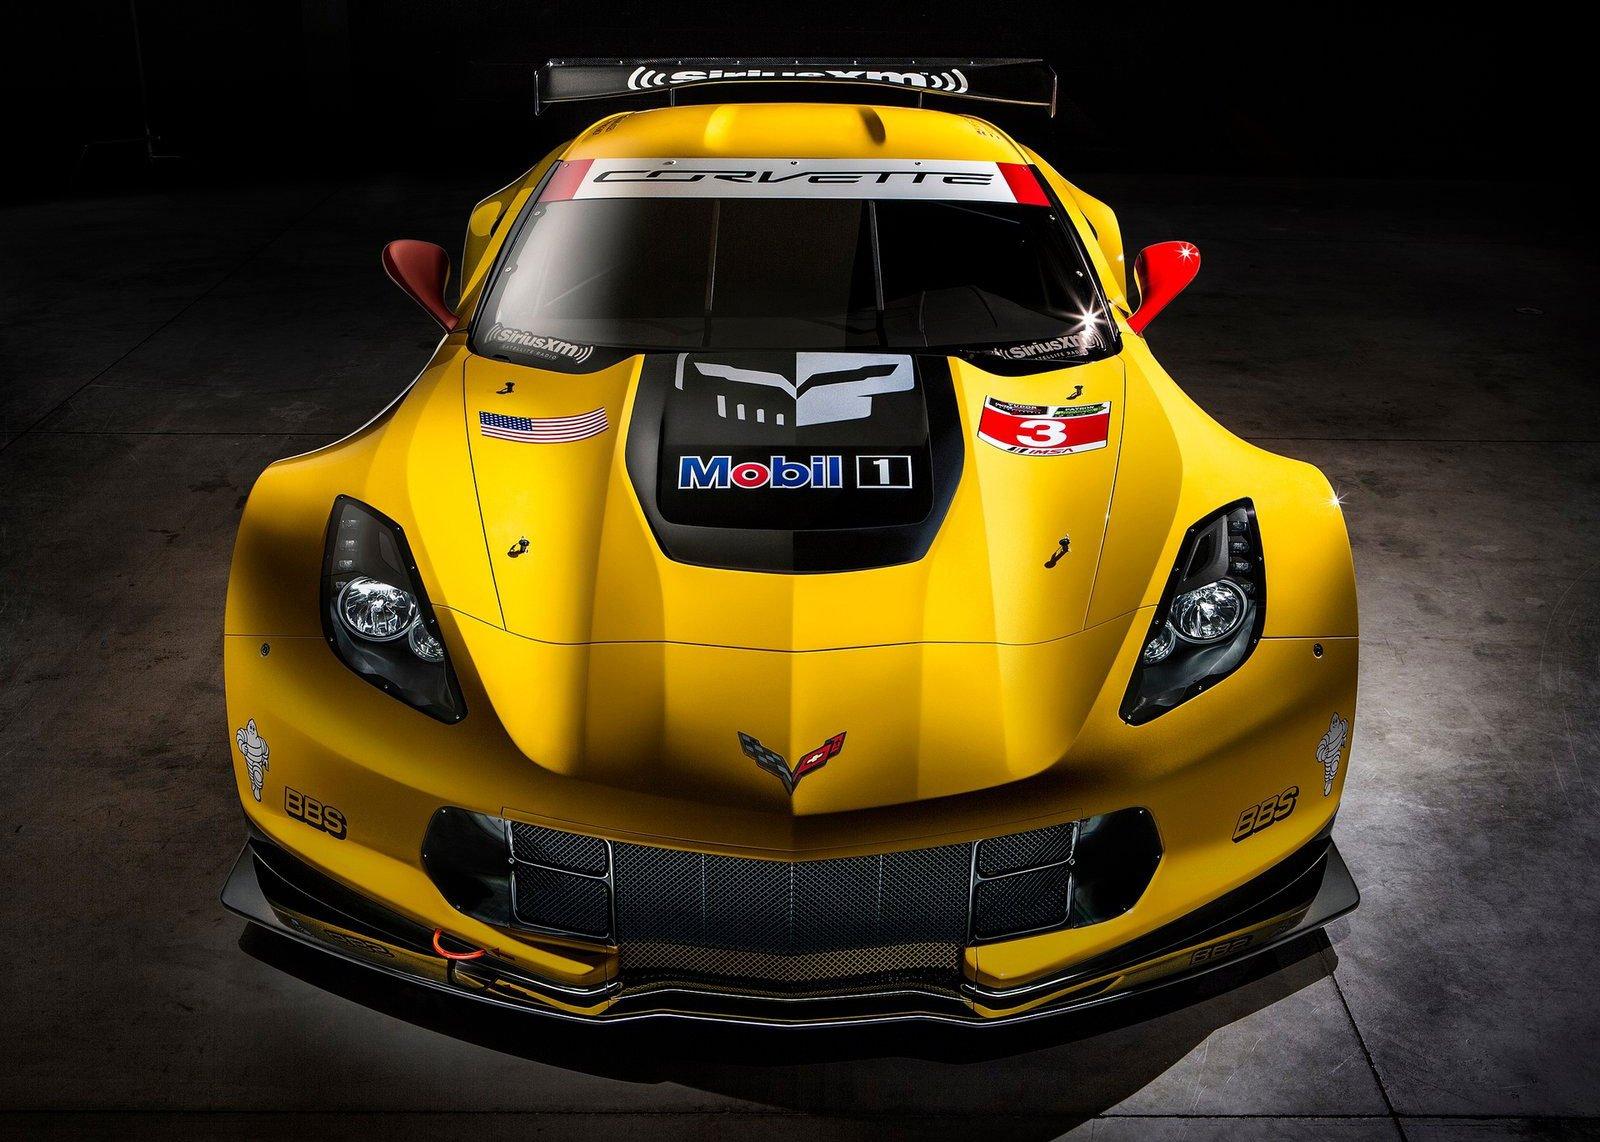 chevrolet corvette c7 r race car sister of the z06. Black Bedroom Furniture Sets. Home Design Ideas